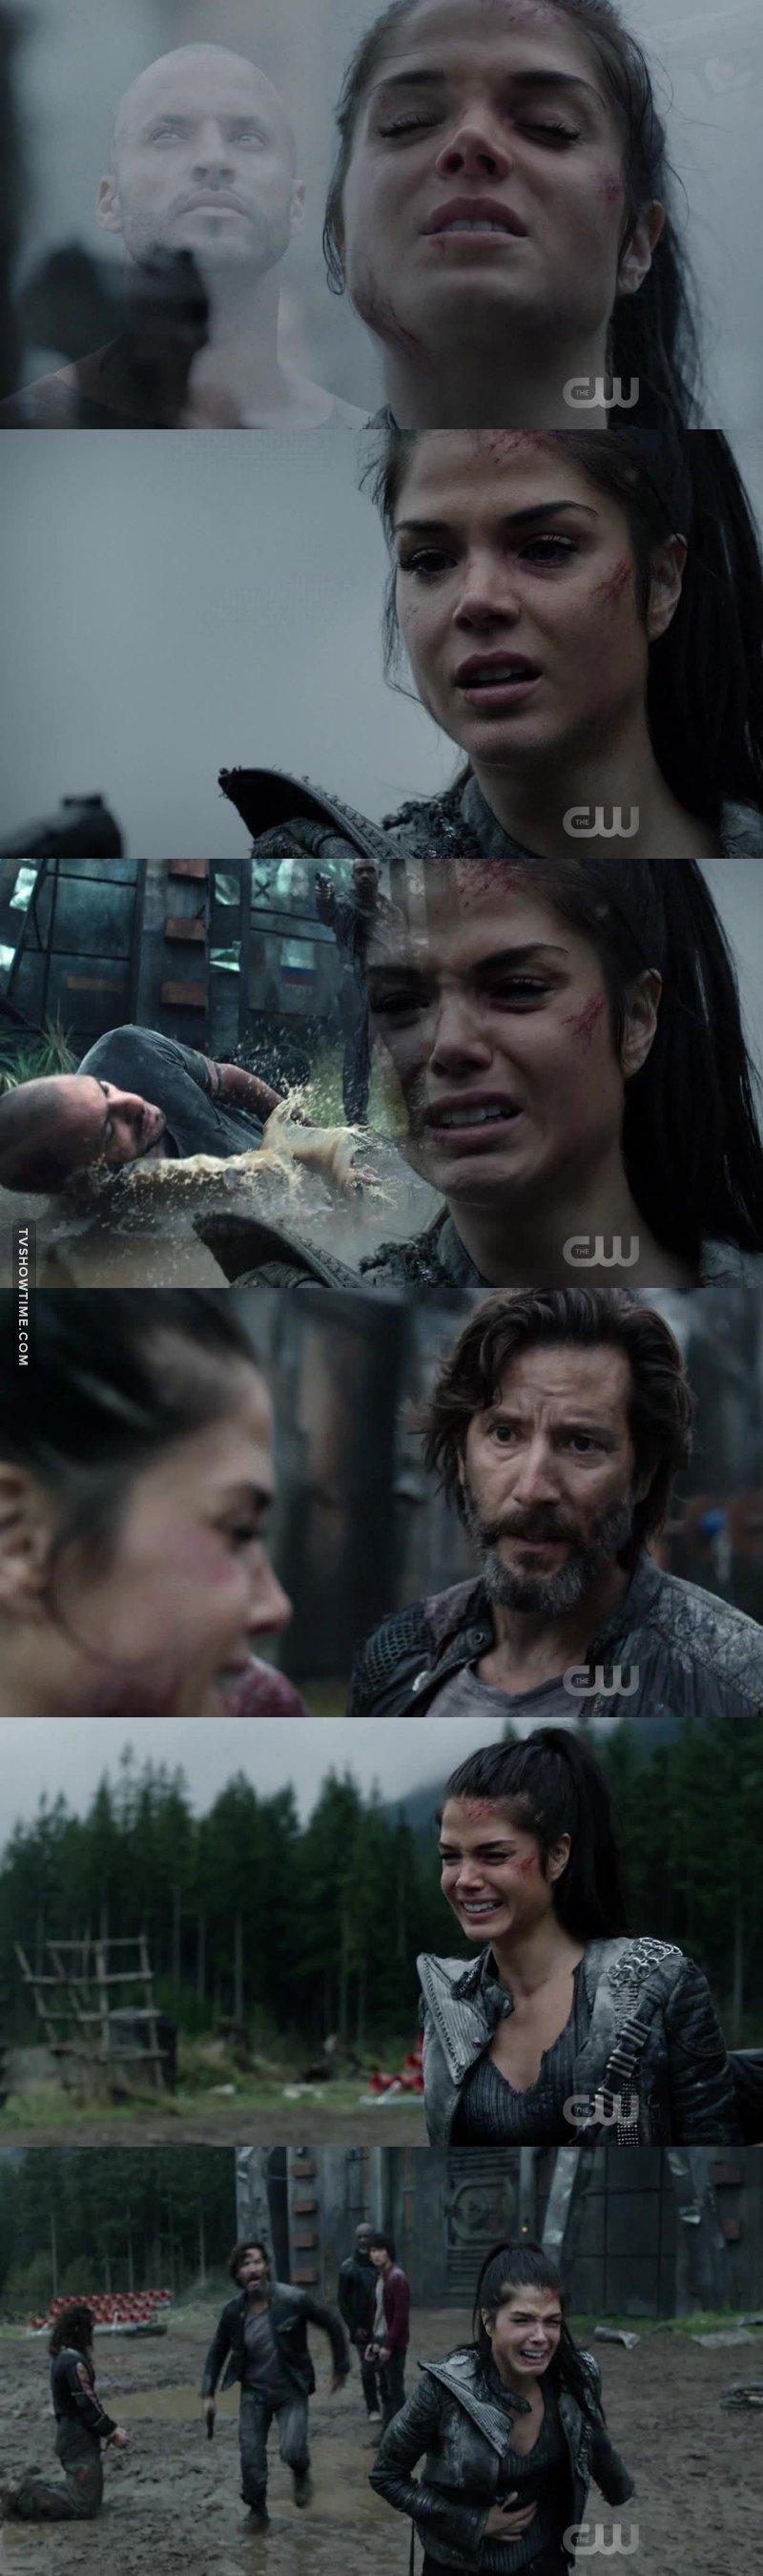 This scene killed me! 😭😭